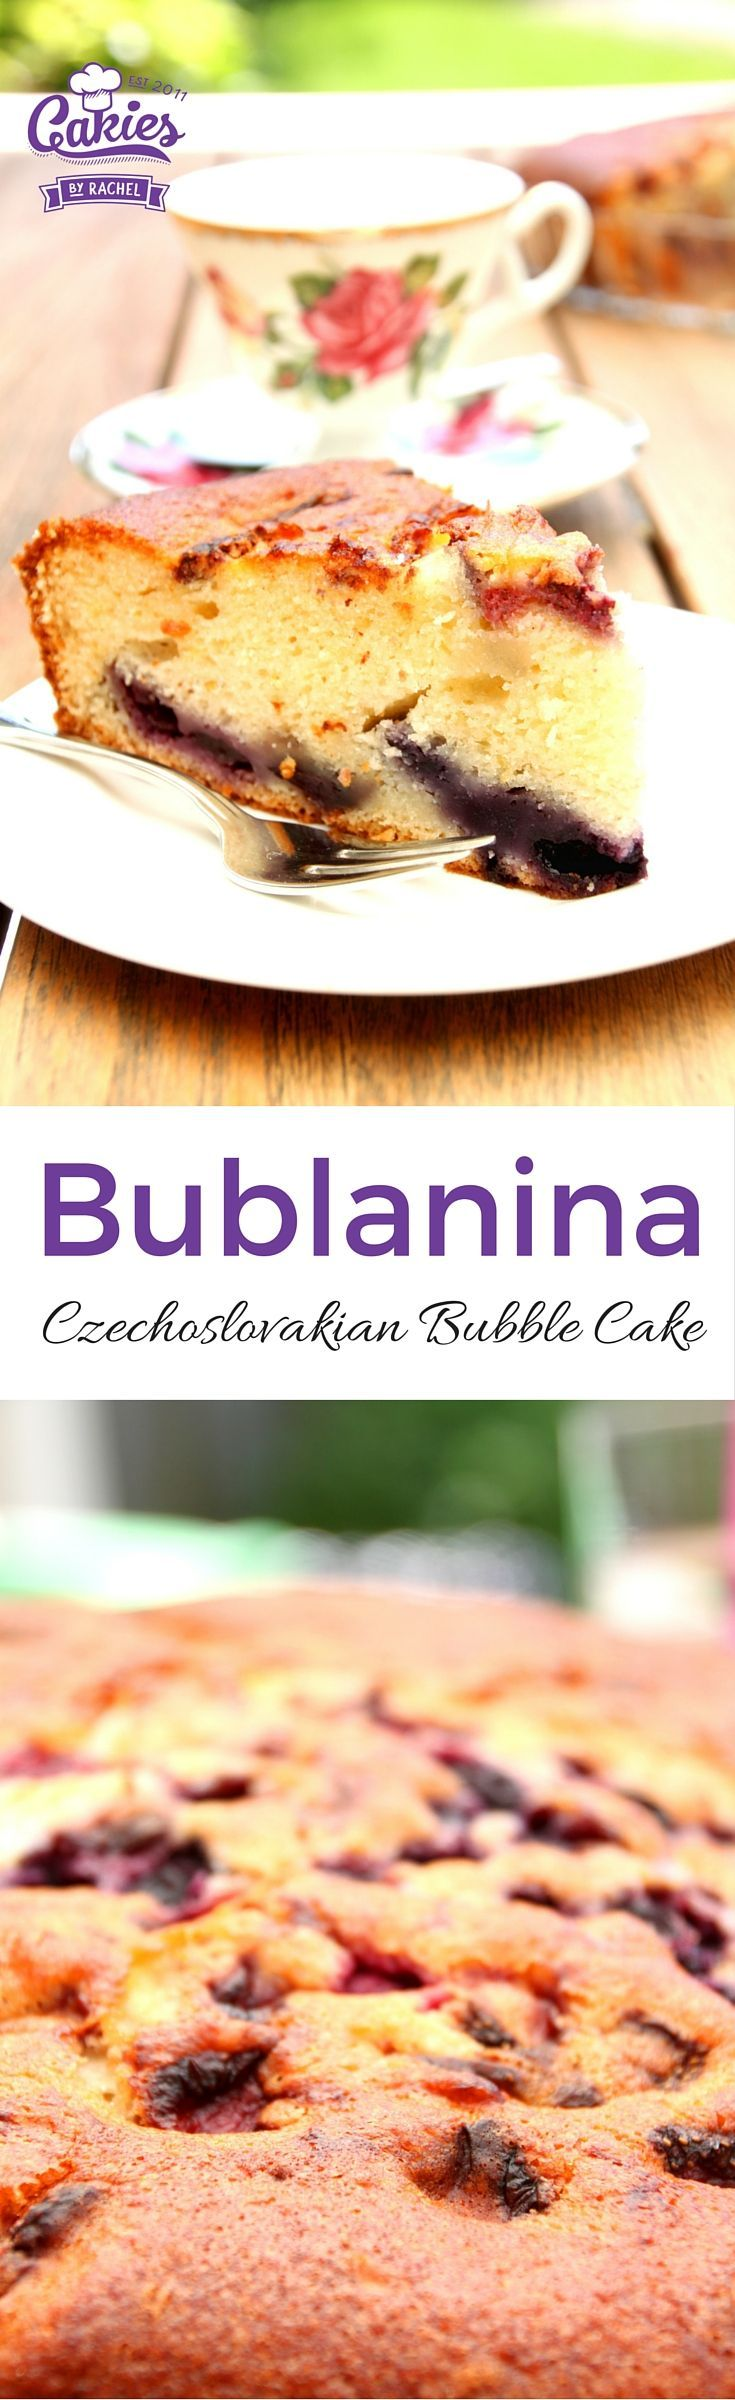 35 best food czech foods recipes images on pinterest czech bublanina recipe a czechoslovakian bubble cake forumfinder Gallery